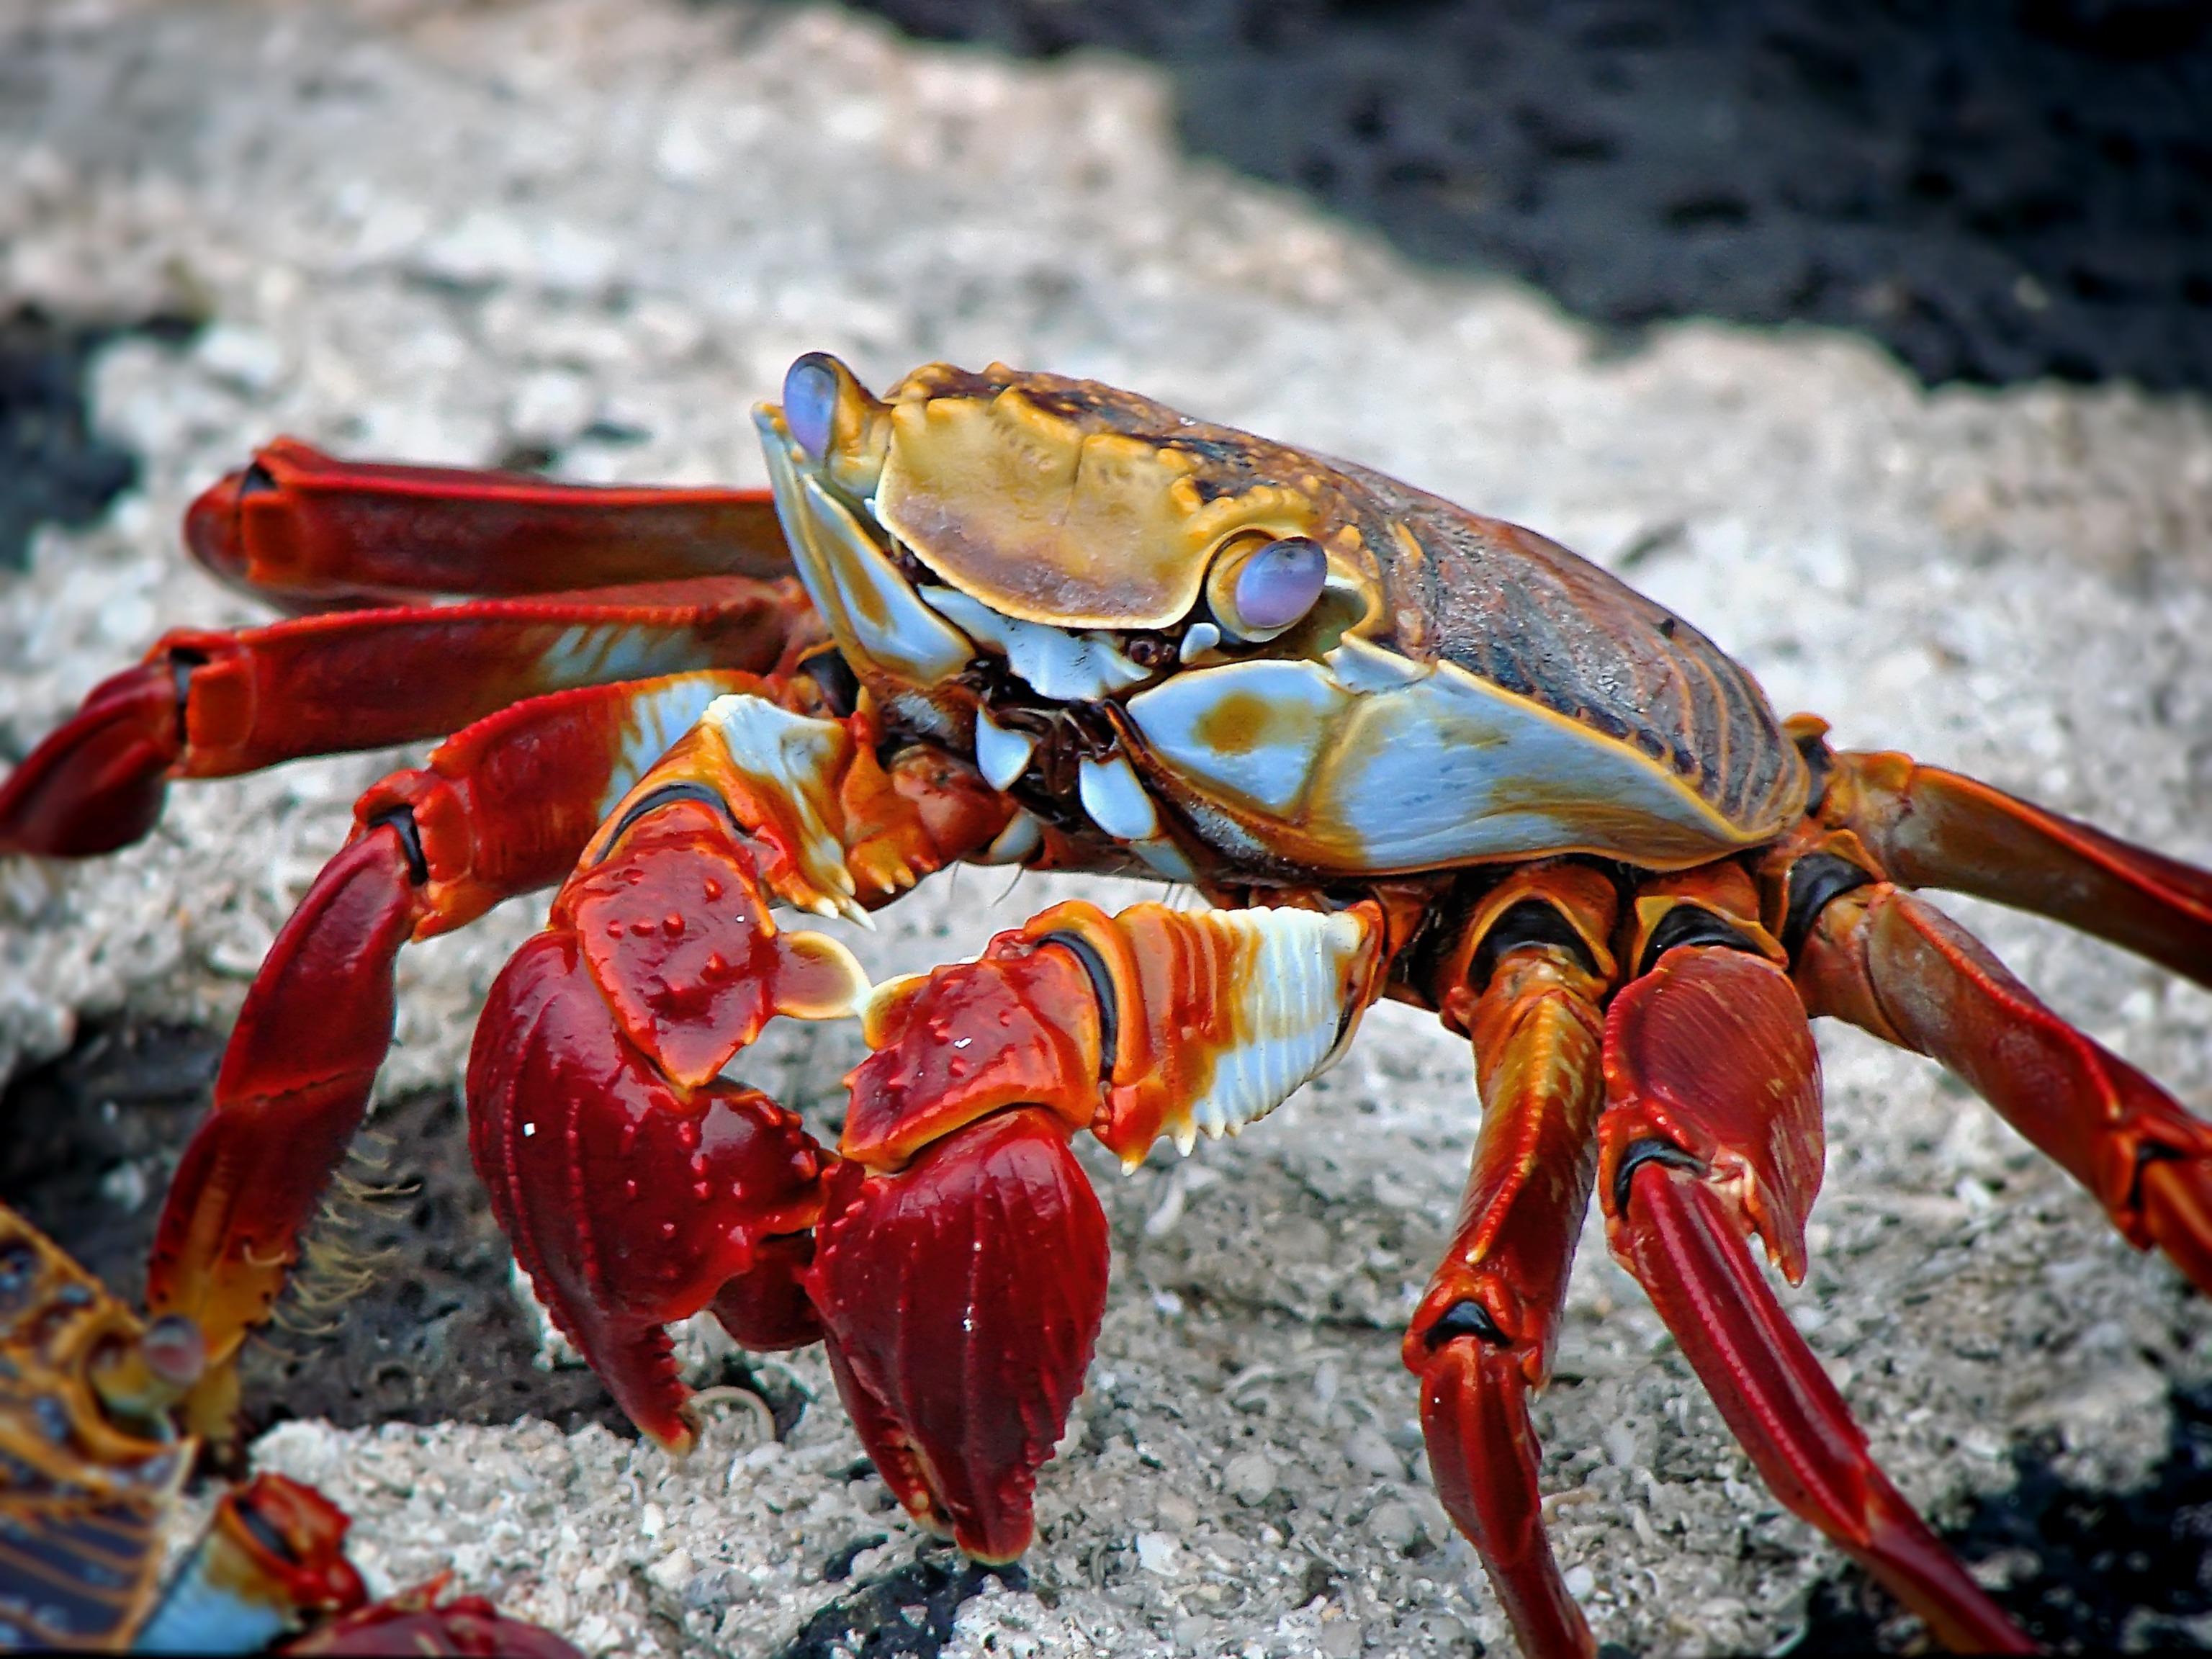 free stock photos of crab pexels